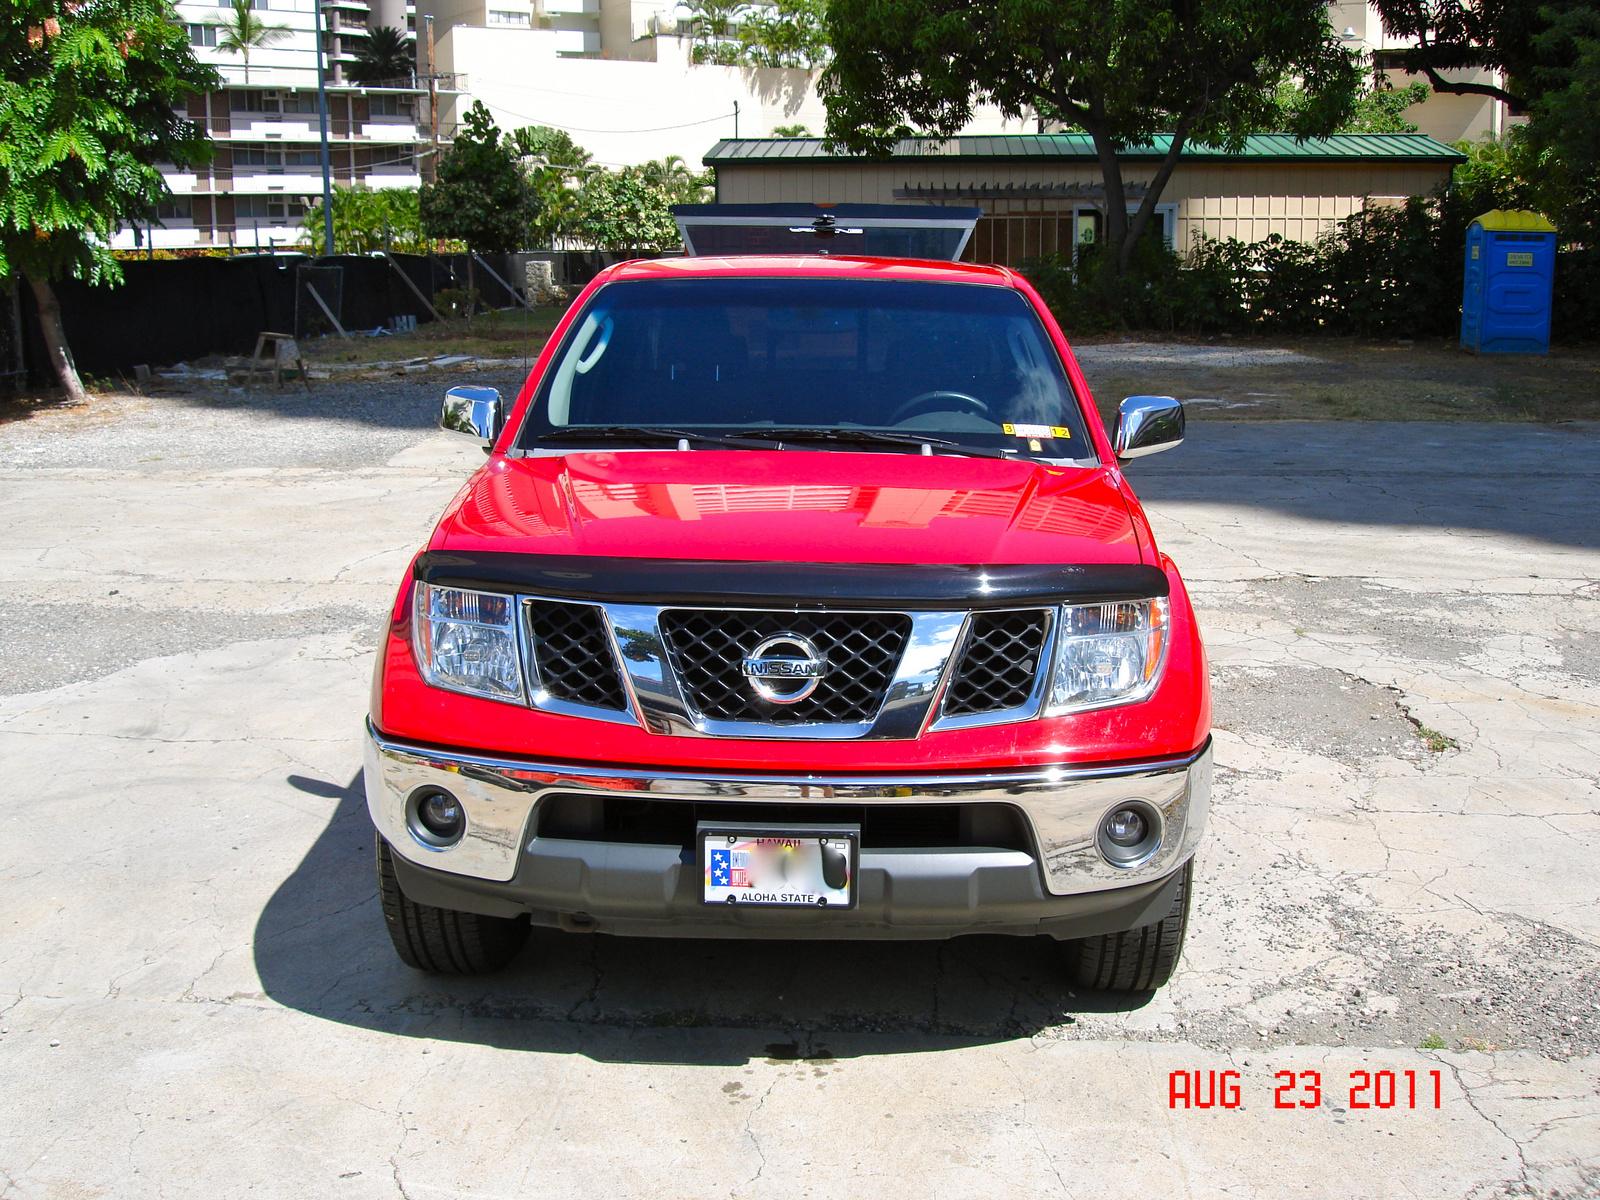 2006 Nissan Frontier Nismo - Picture of 2006 Nissan Frontie ...